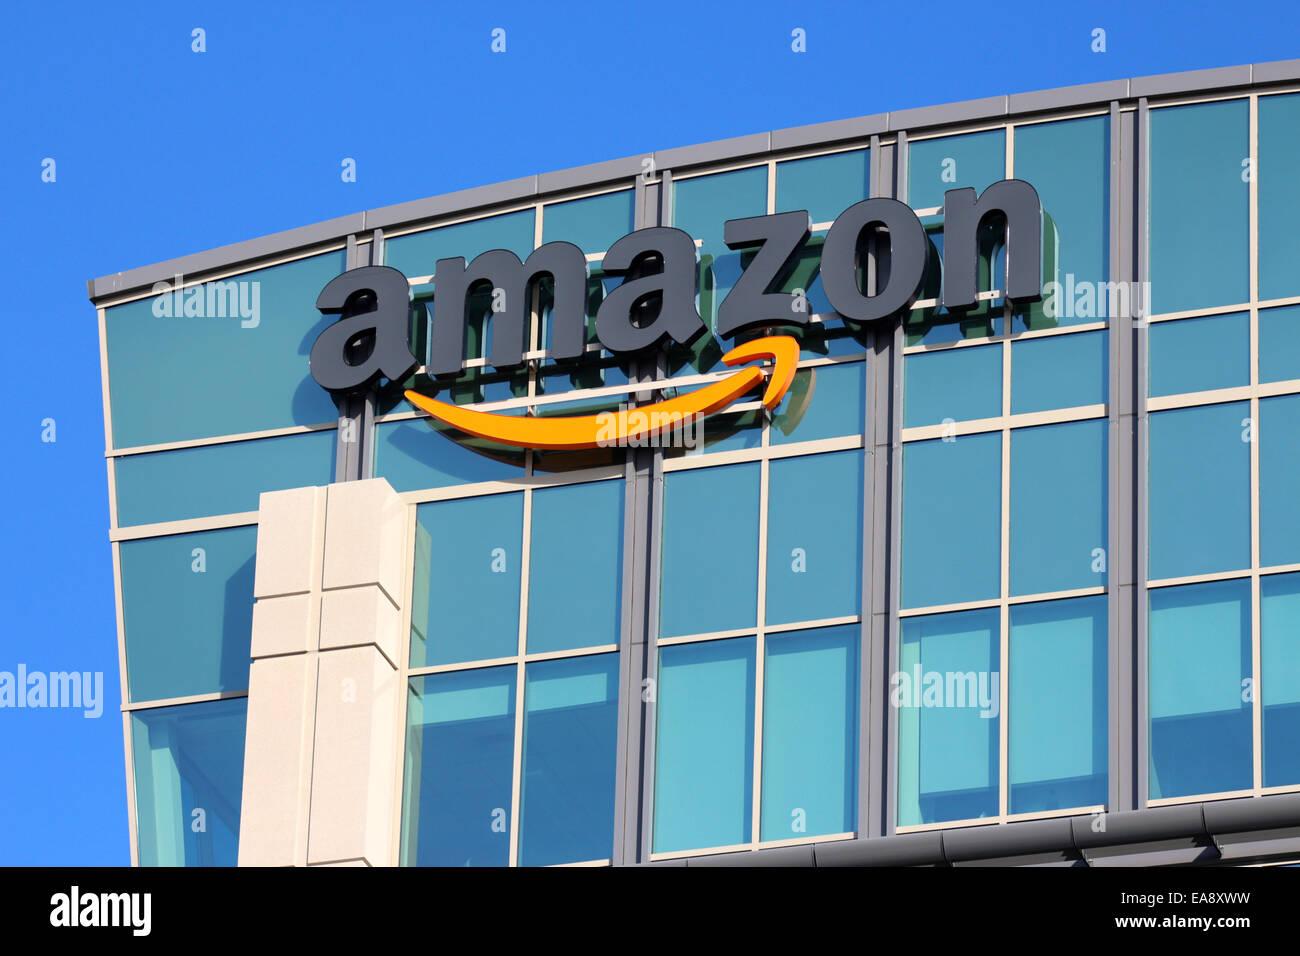 Amazon Corporate Office Building à Sunnyvale, California USA Photo Stock